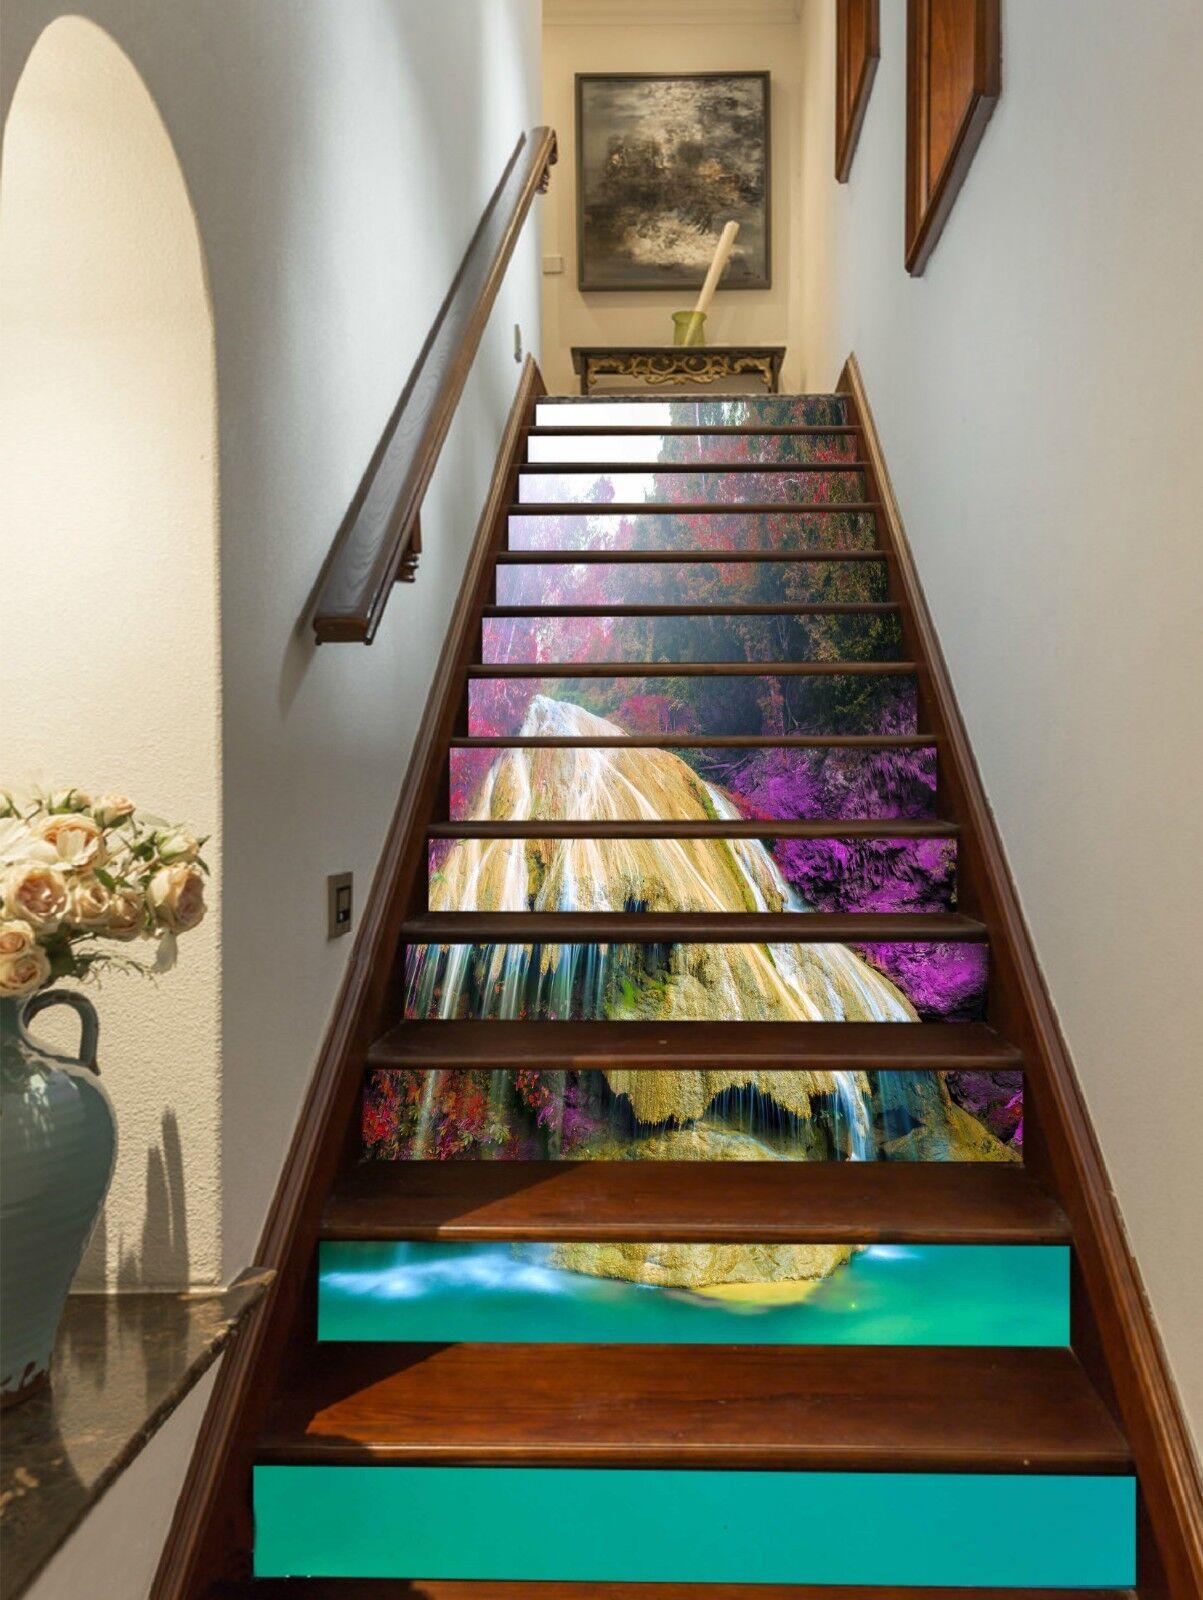 3D Bule Stream Stair Risers Decoration Photo Mural Vinyl Decal Wallpaper UK